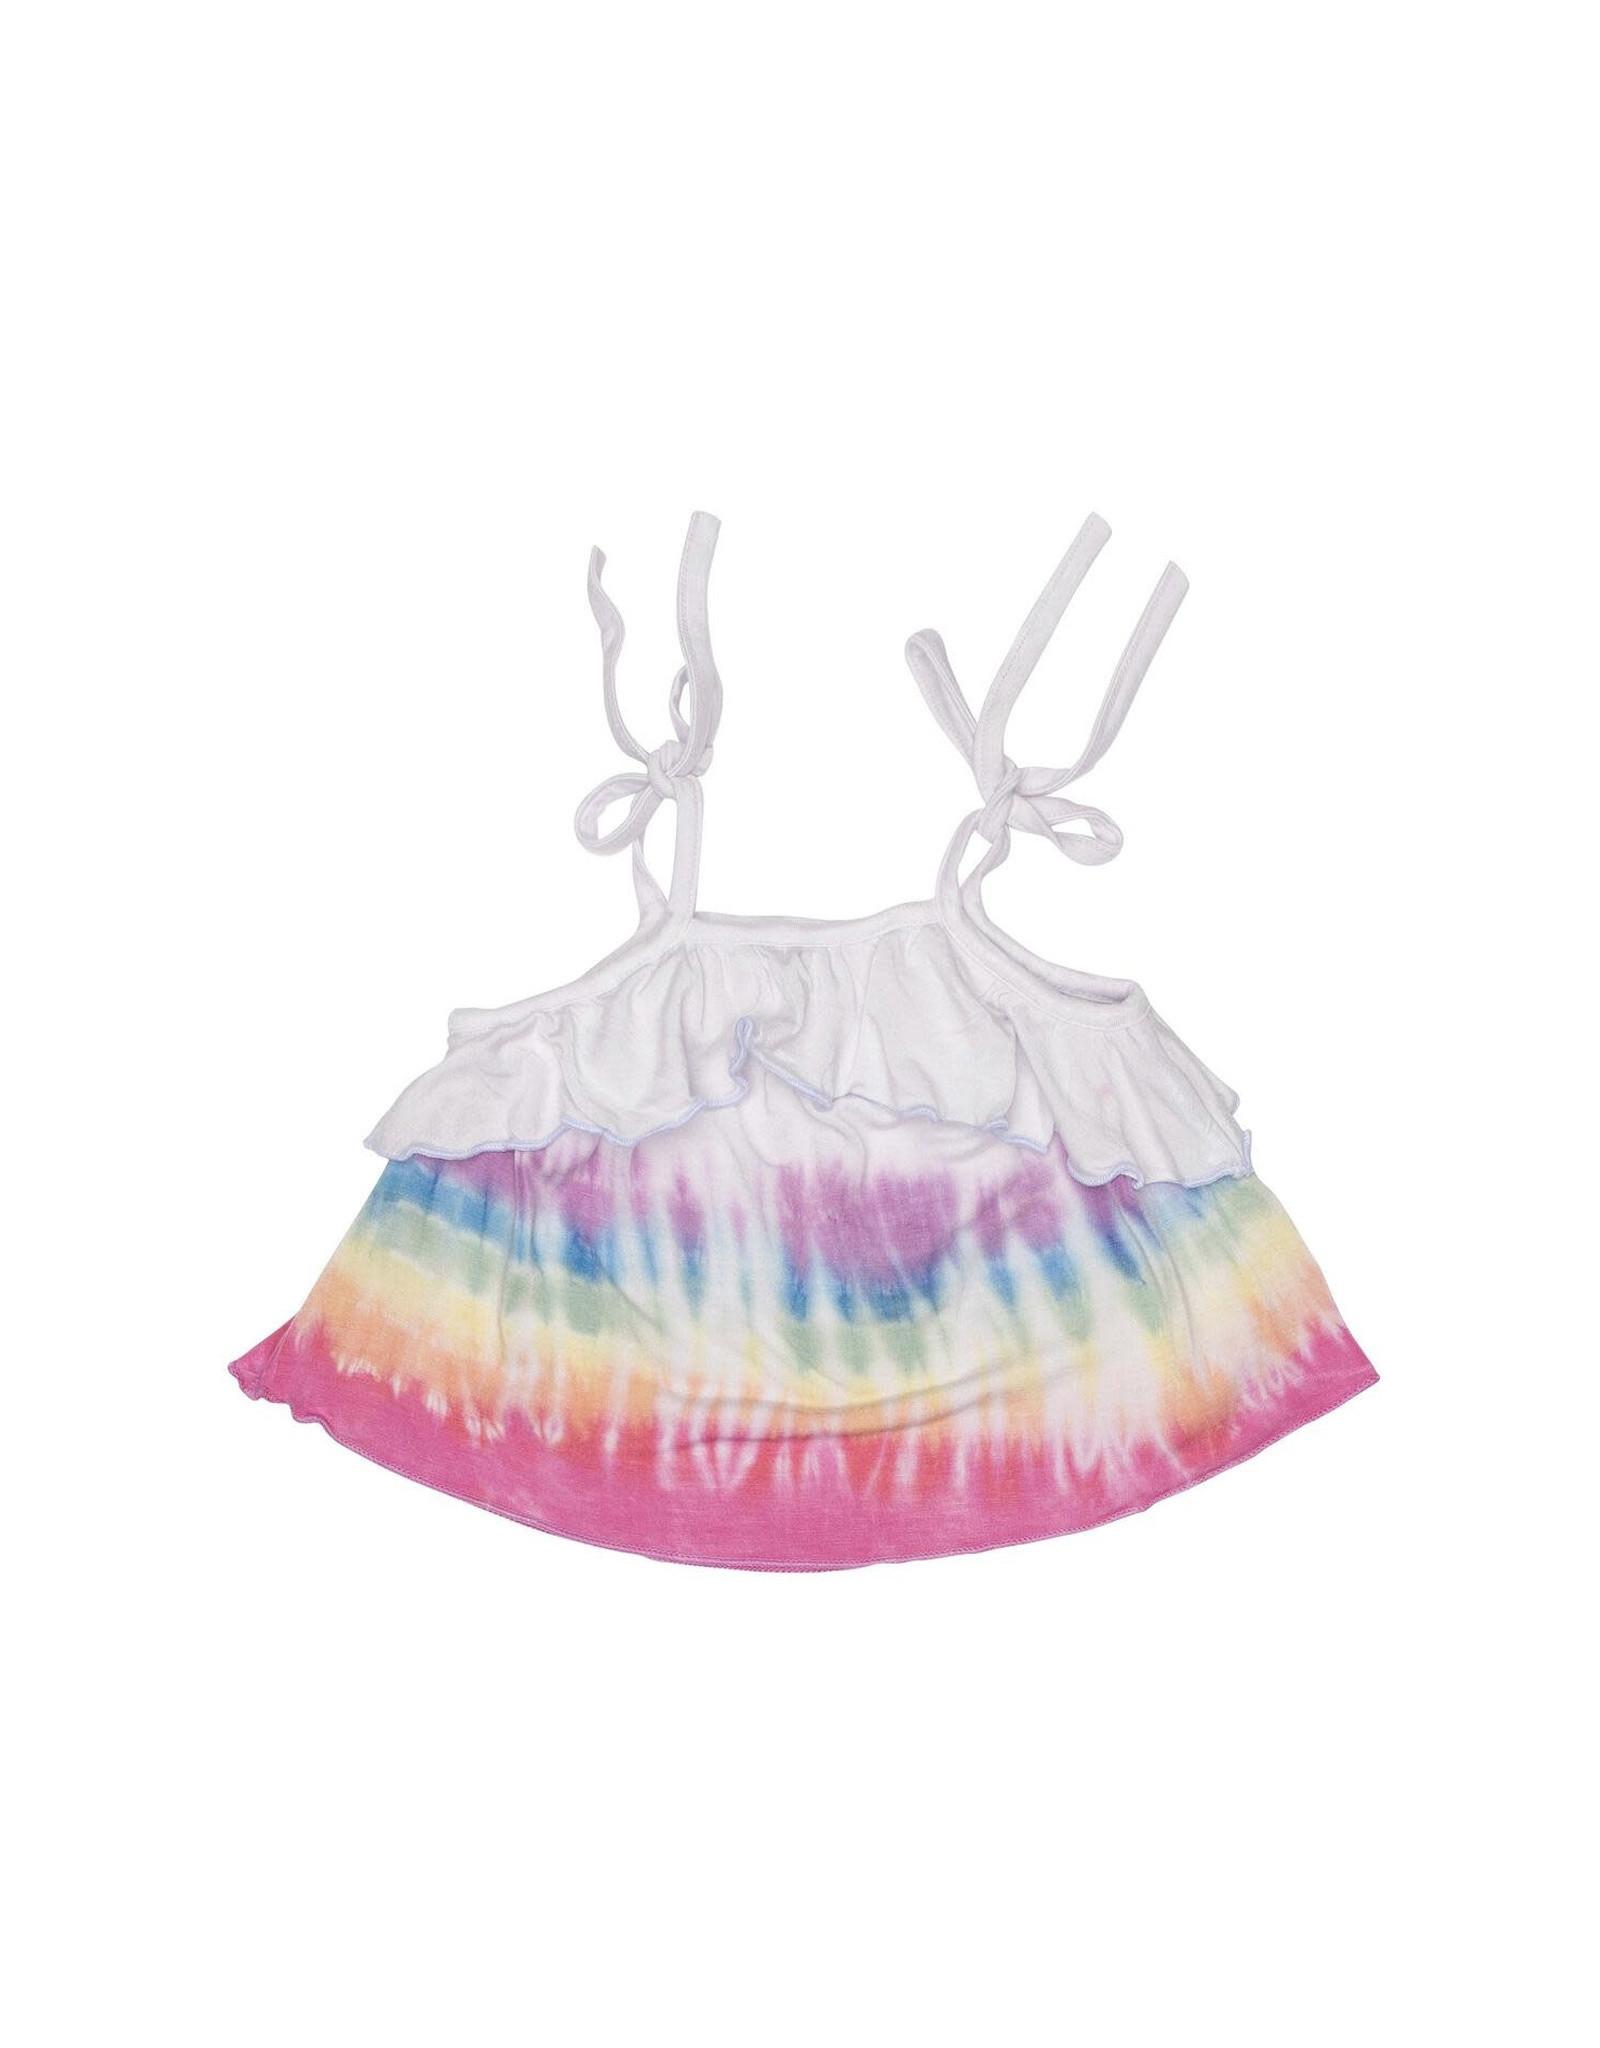 Fairwell Spirit Tank Lilac Rainbow